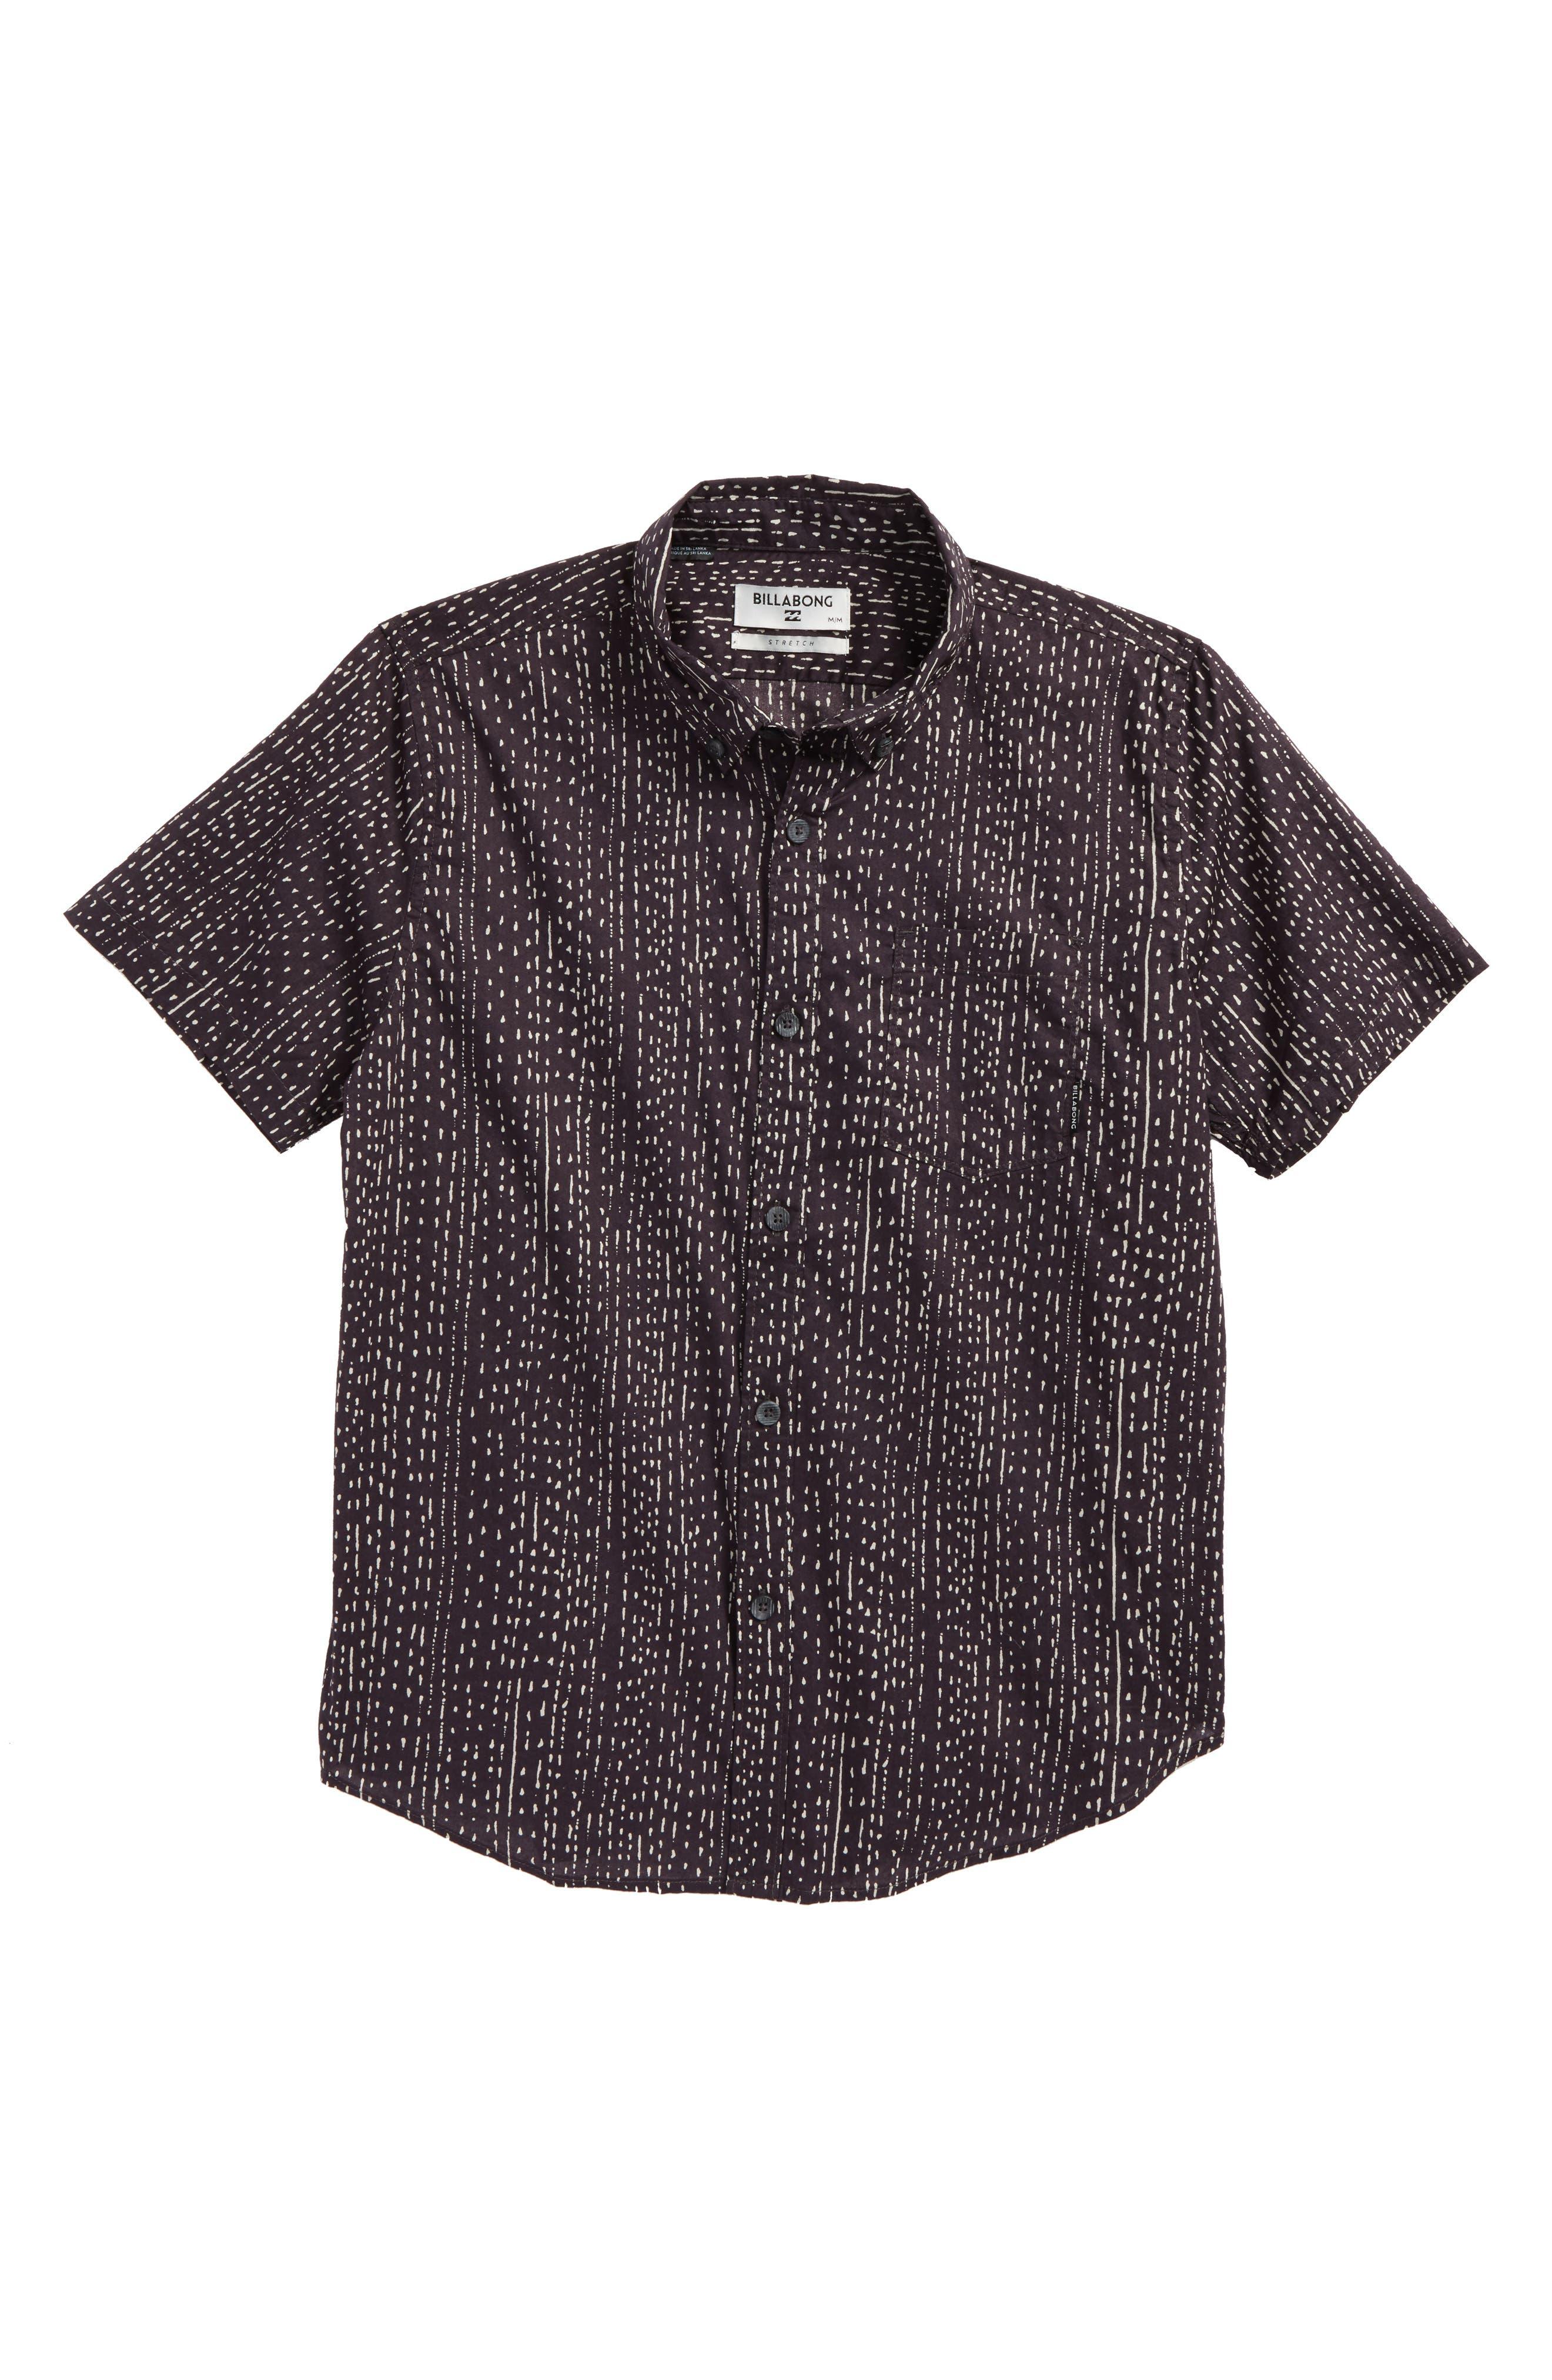 Sundays Mini Short Sleeve Woven Shirt,                         Main,                         color, 020